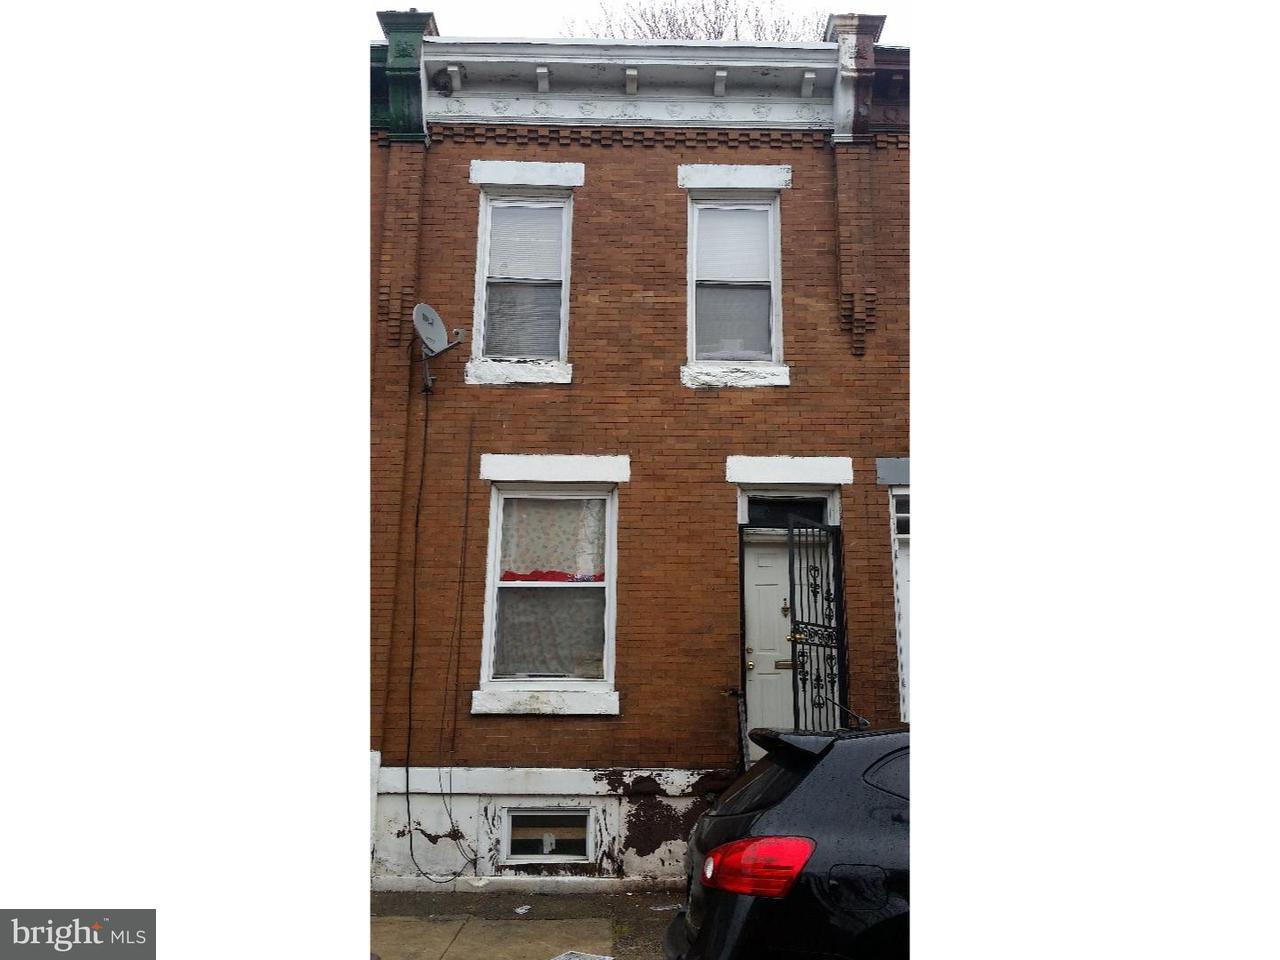 2753 N Bonsall Philadelphia, PA 19132